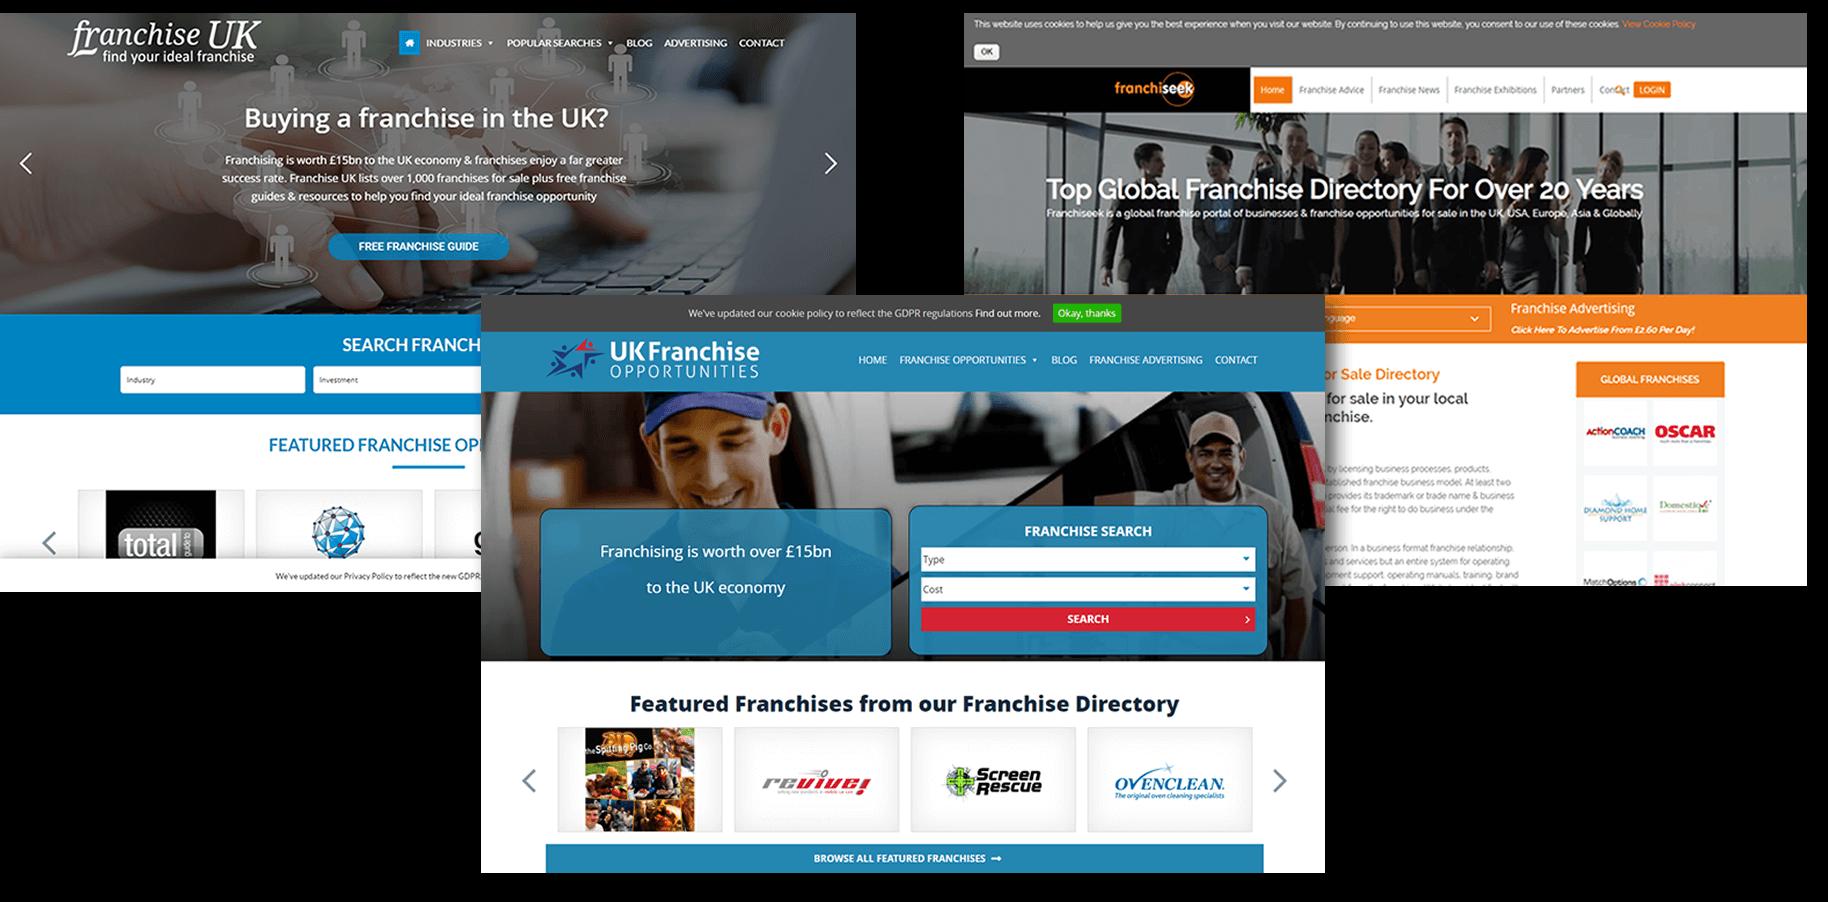 IBGN Websites Franchise UK Franchiseek UK Franchise Opportunities